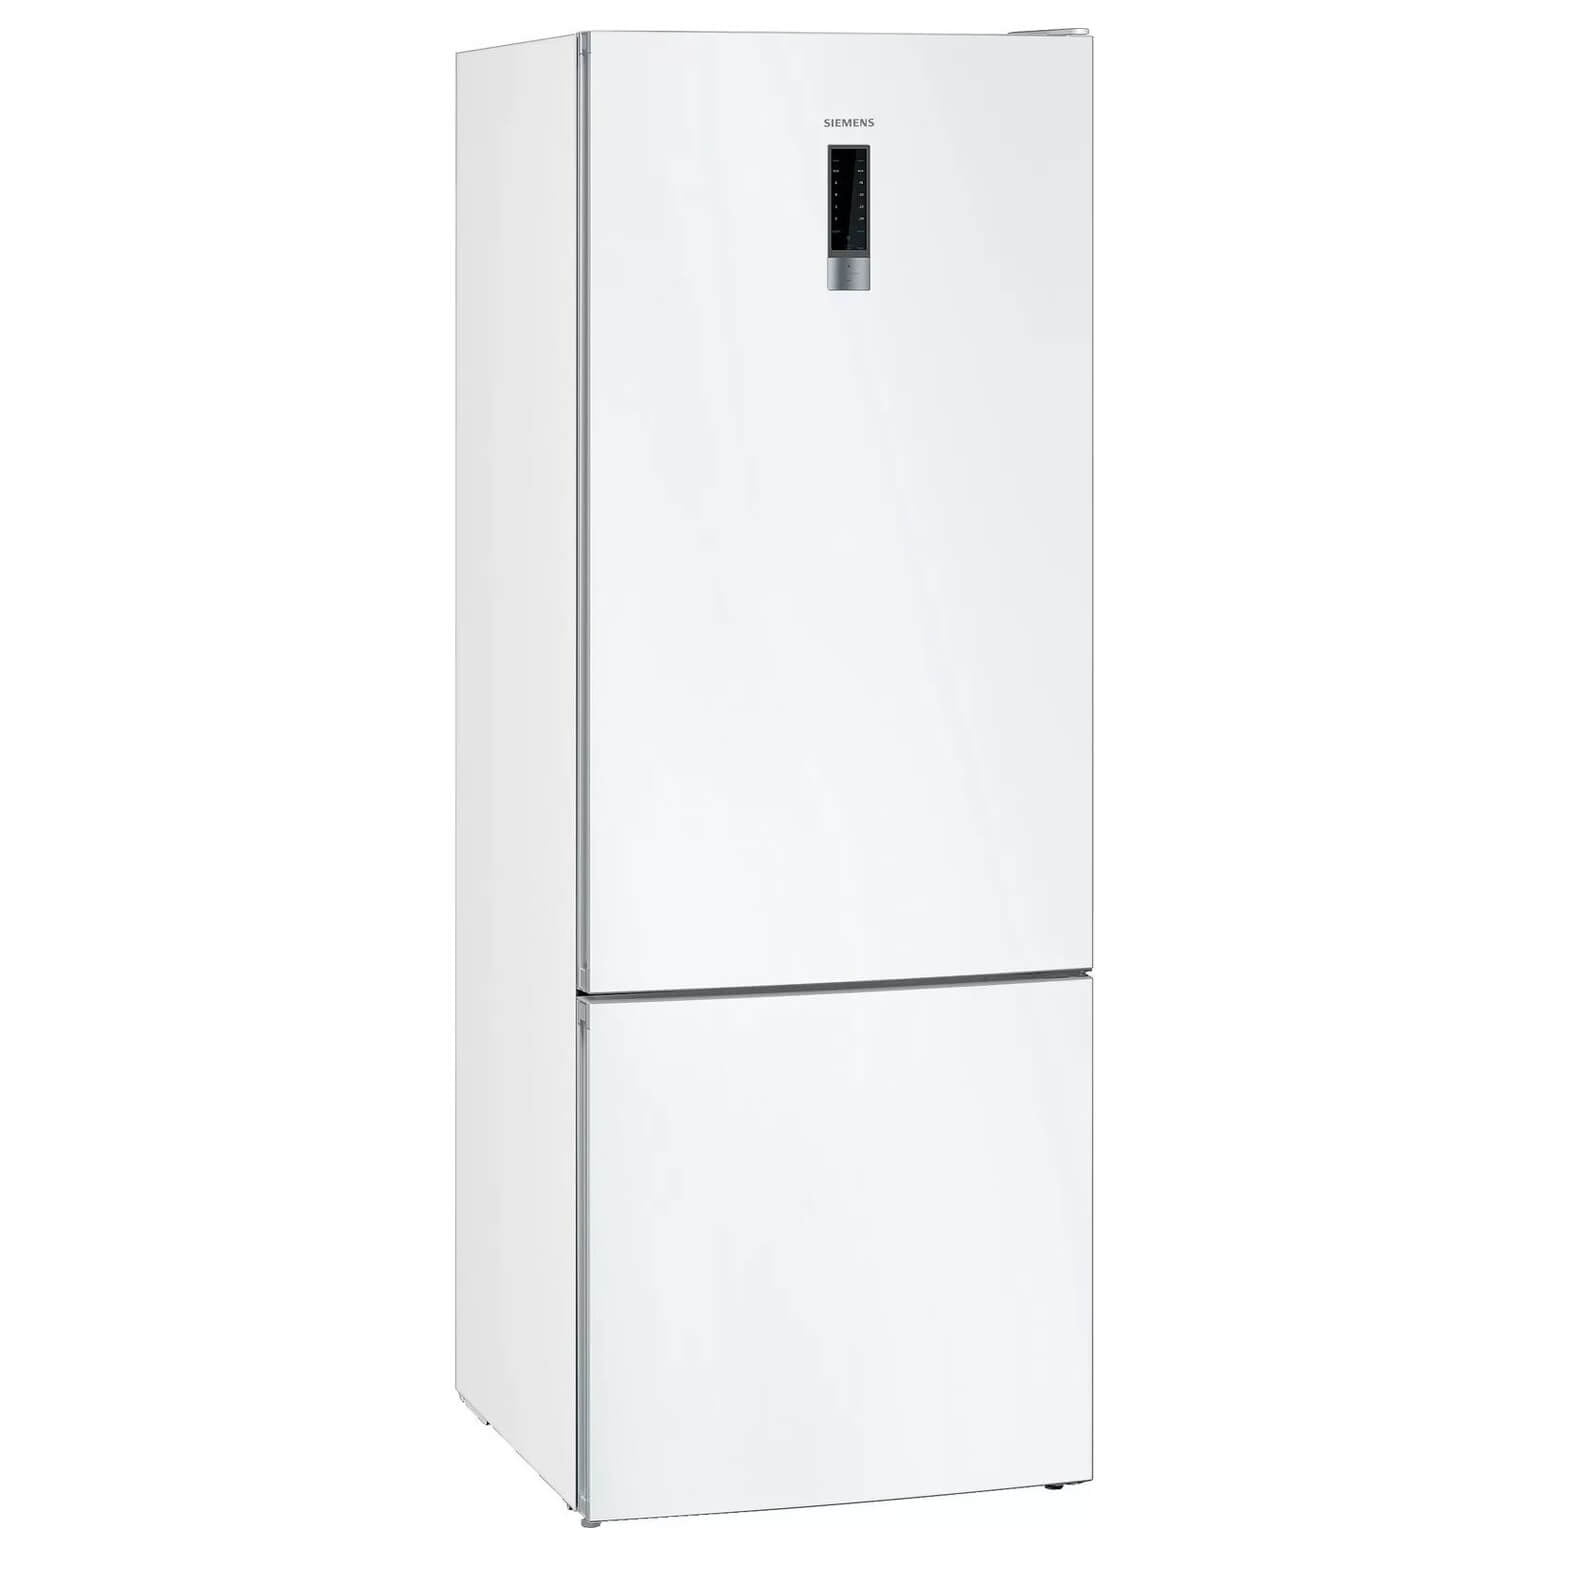 Siemens KG56NVWF0N buzdolabi